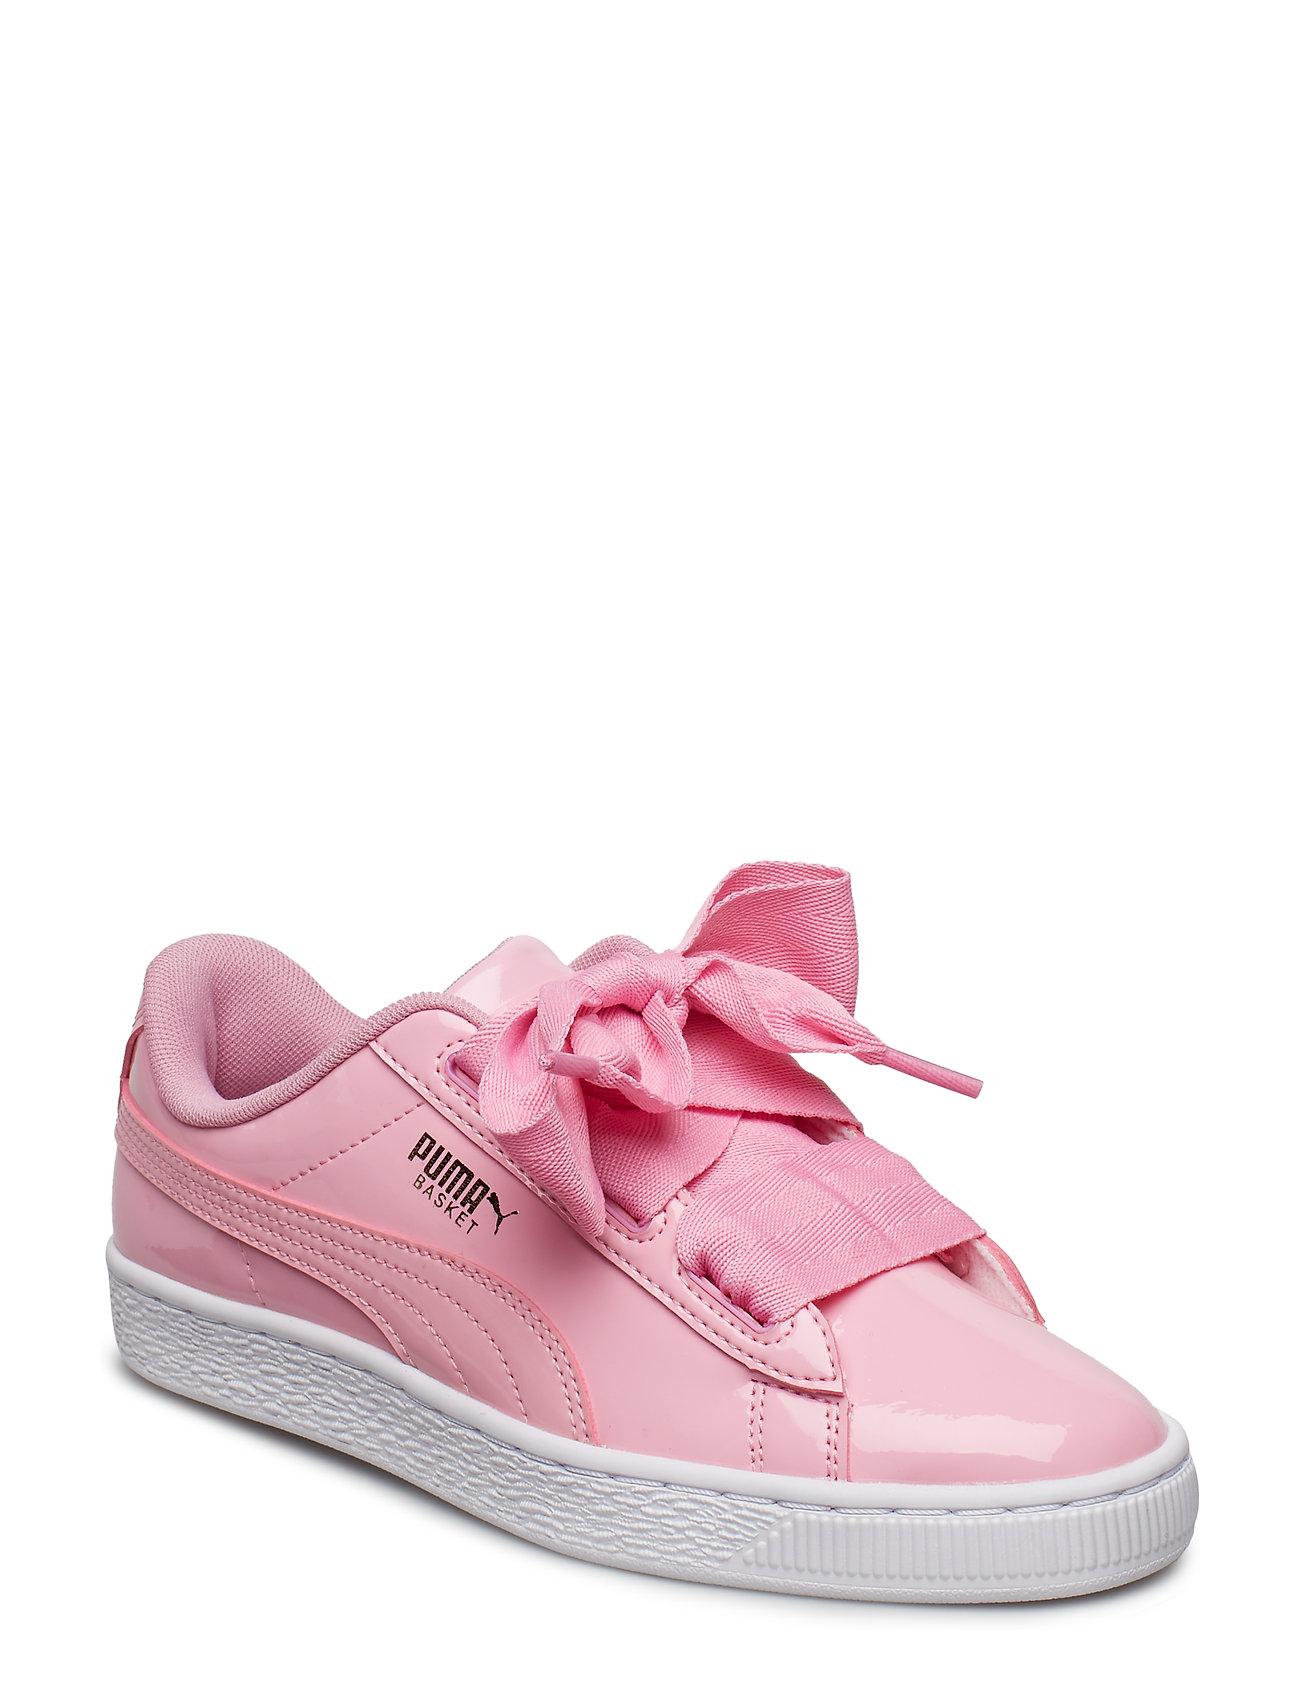 best sneakers 06e81 8a3be Basket Heart Patent Jr